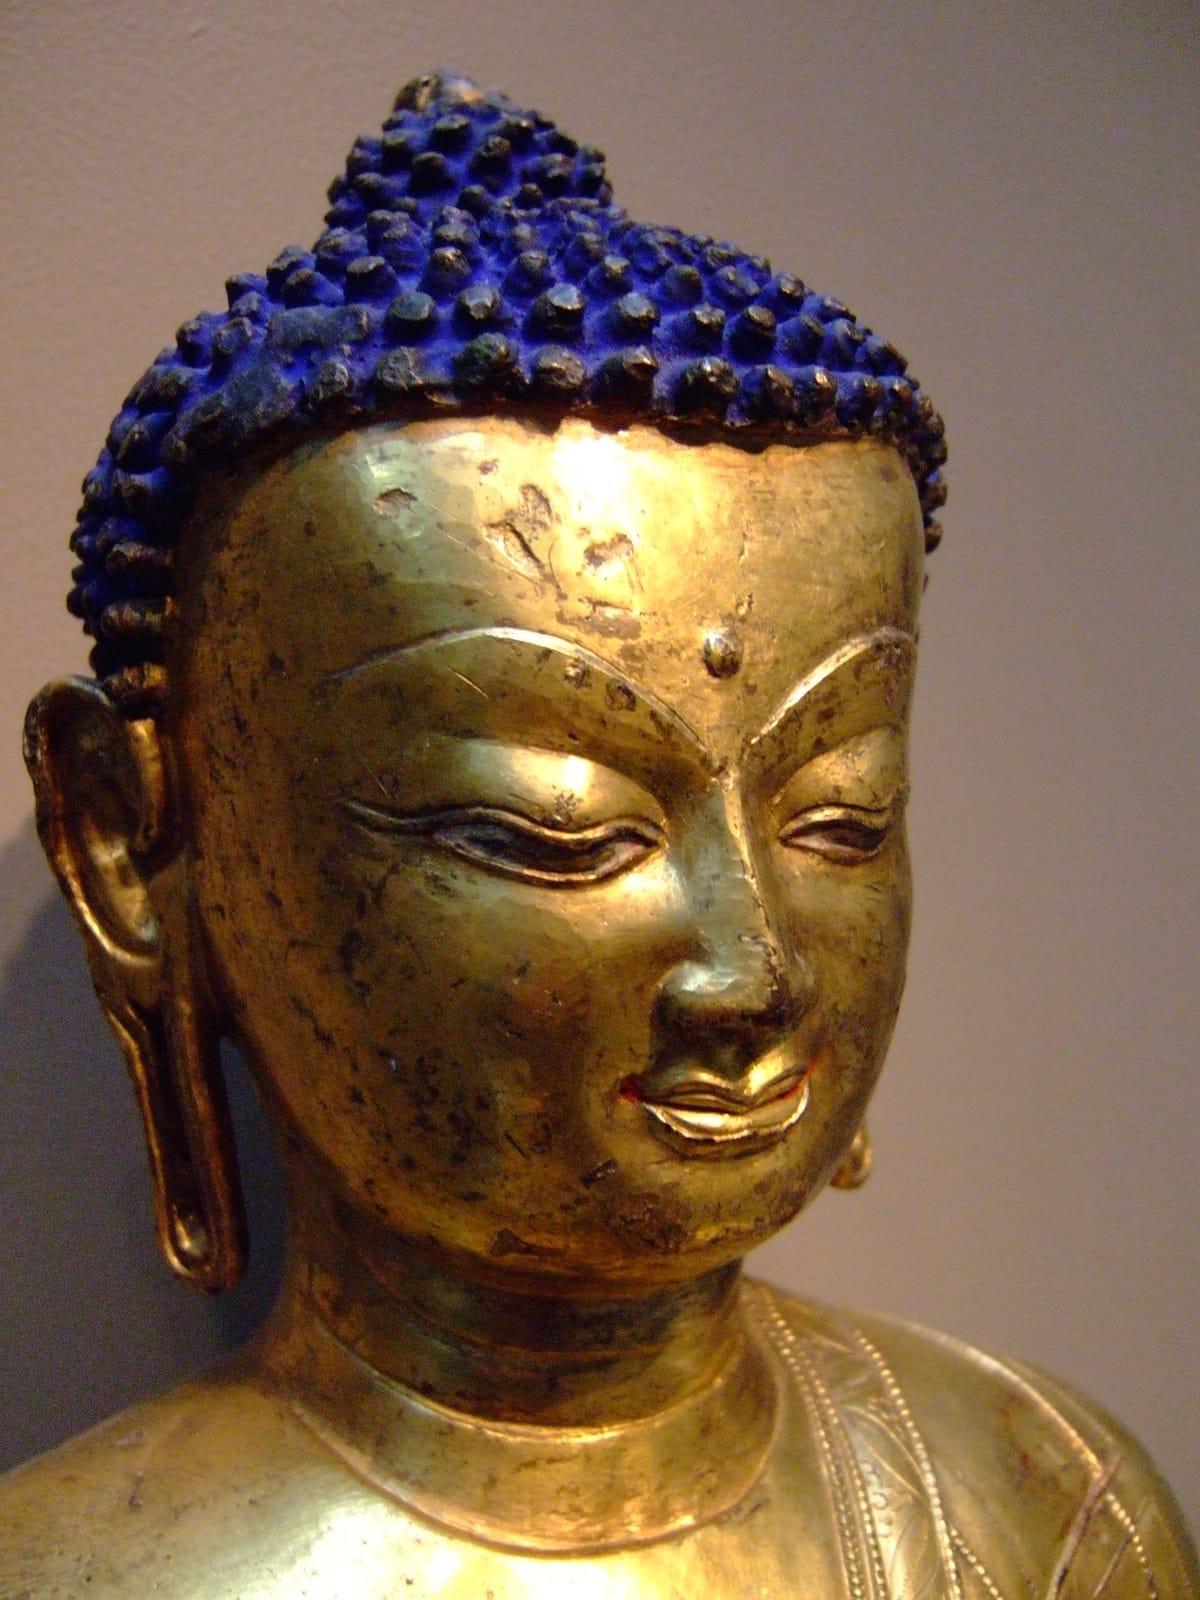 Sakyong Mipham, Chögyam Trungpa Rinpoche, Shambhala Sun, Basic Goodness, Lungta, Lion's Roar, Buddhism